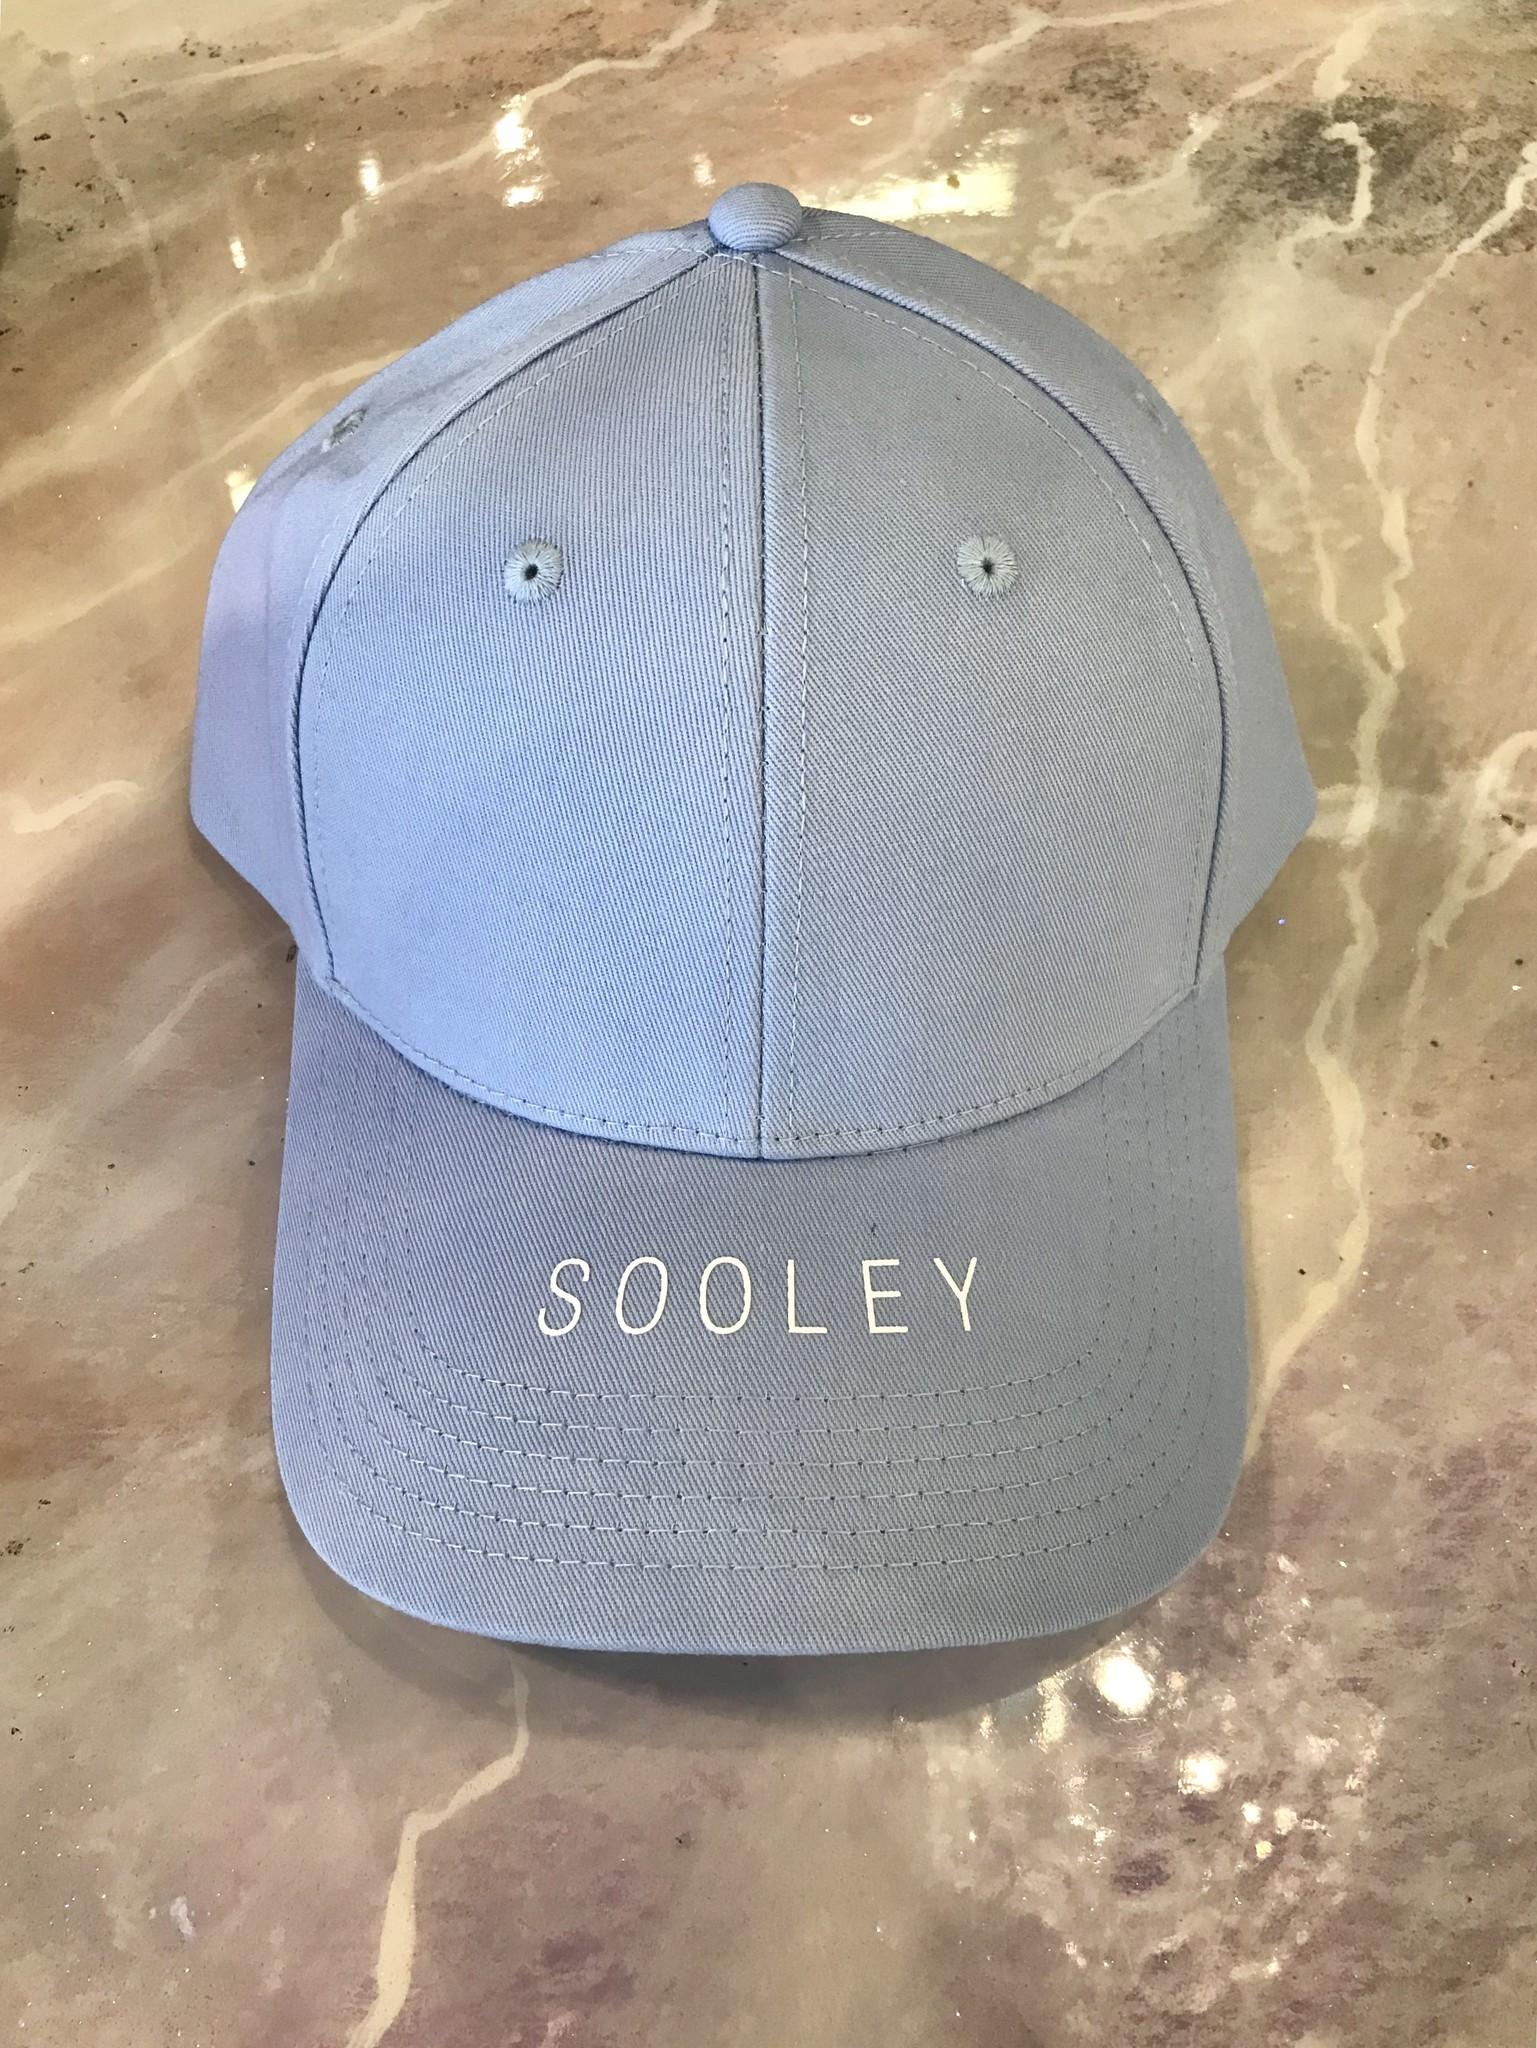 Sooley Designs Sooley Baseball Hat - Baby Blue